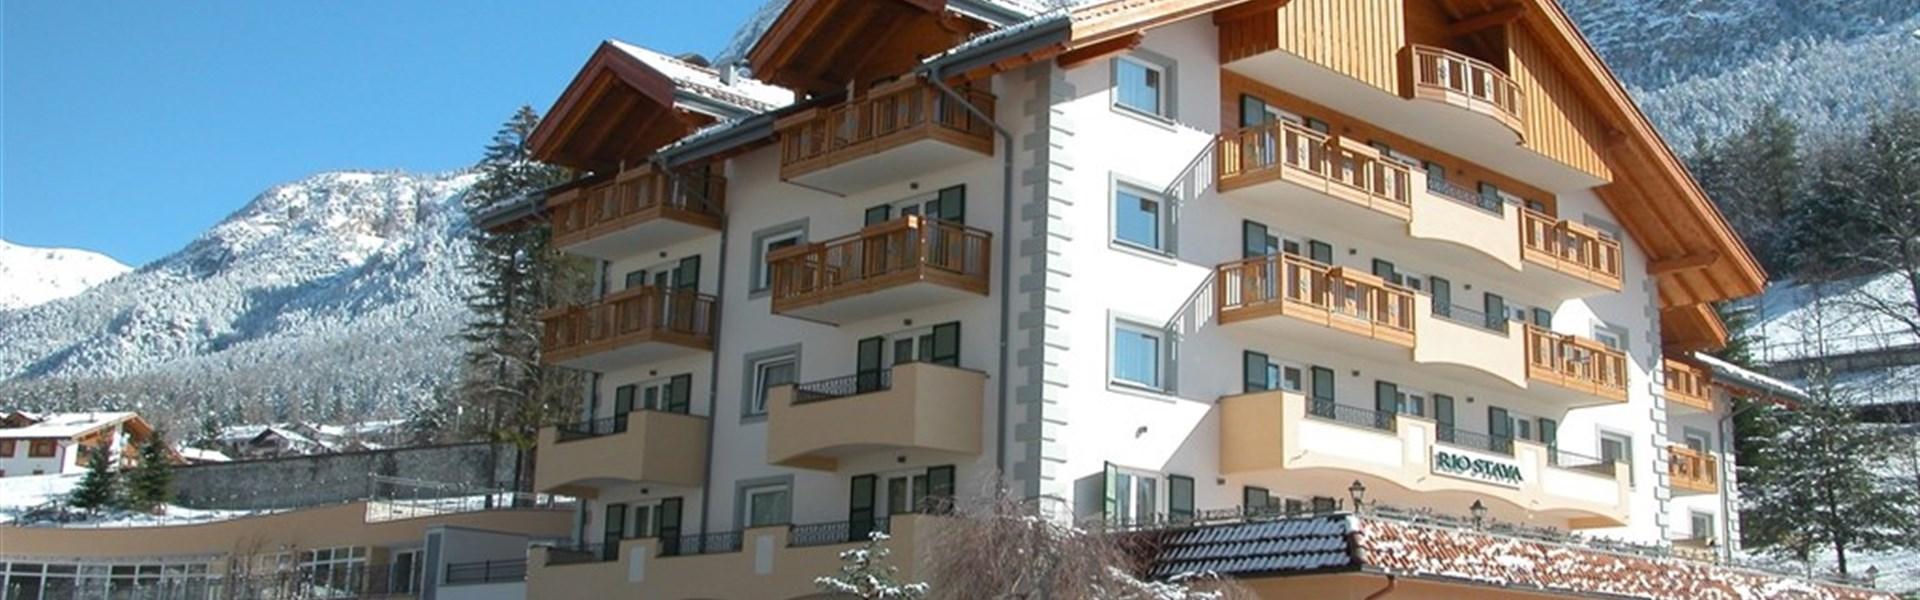 Hotel Rio Stava Family Resort & Spa -